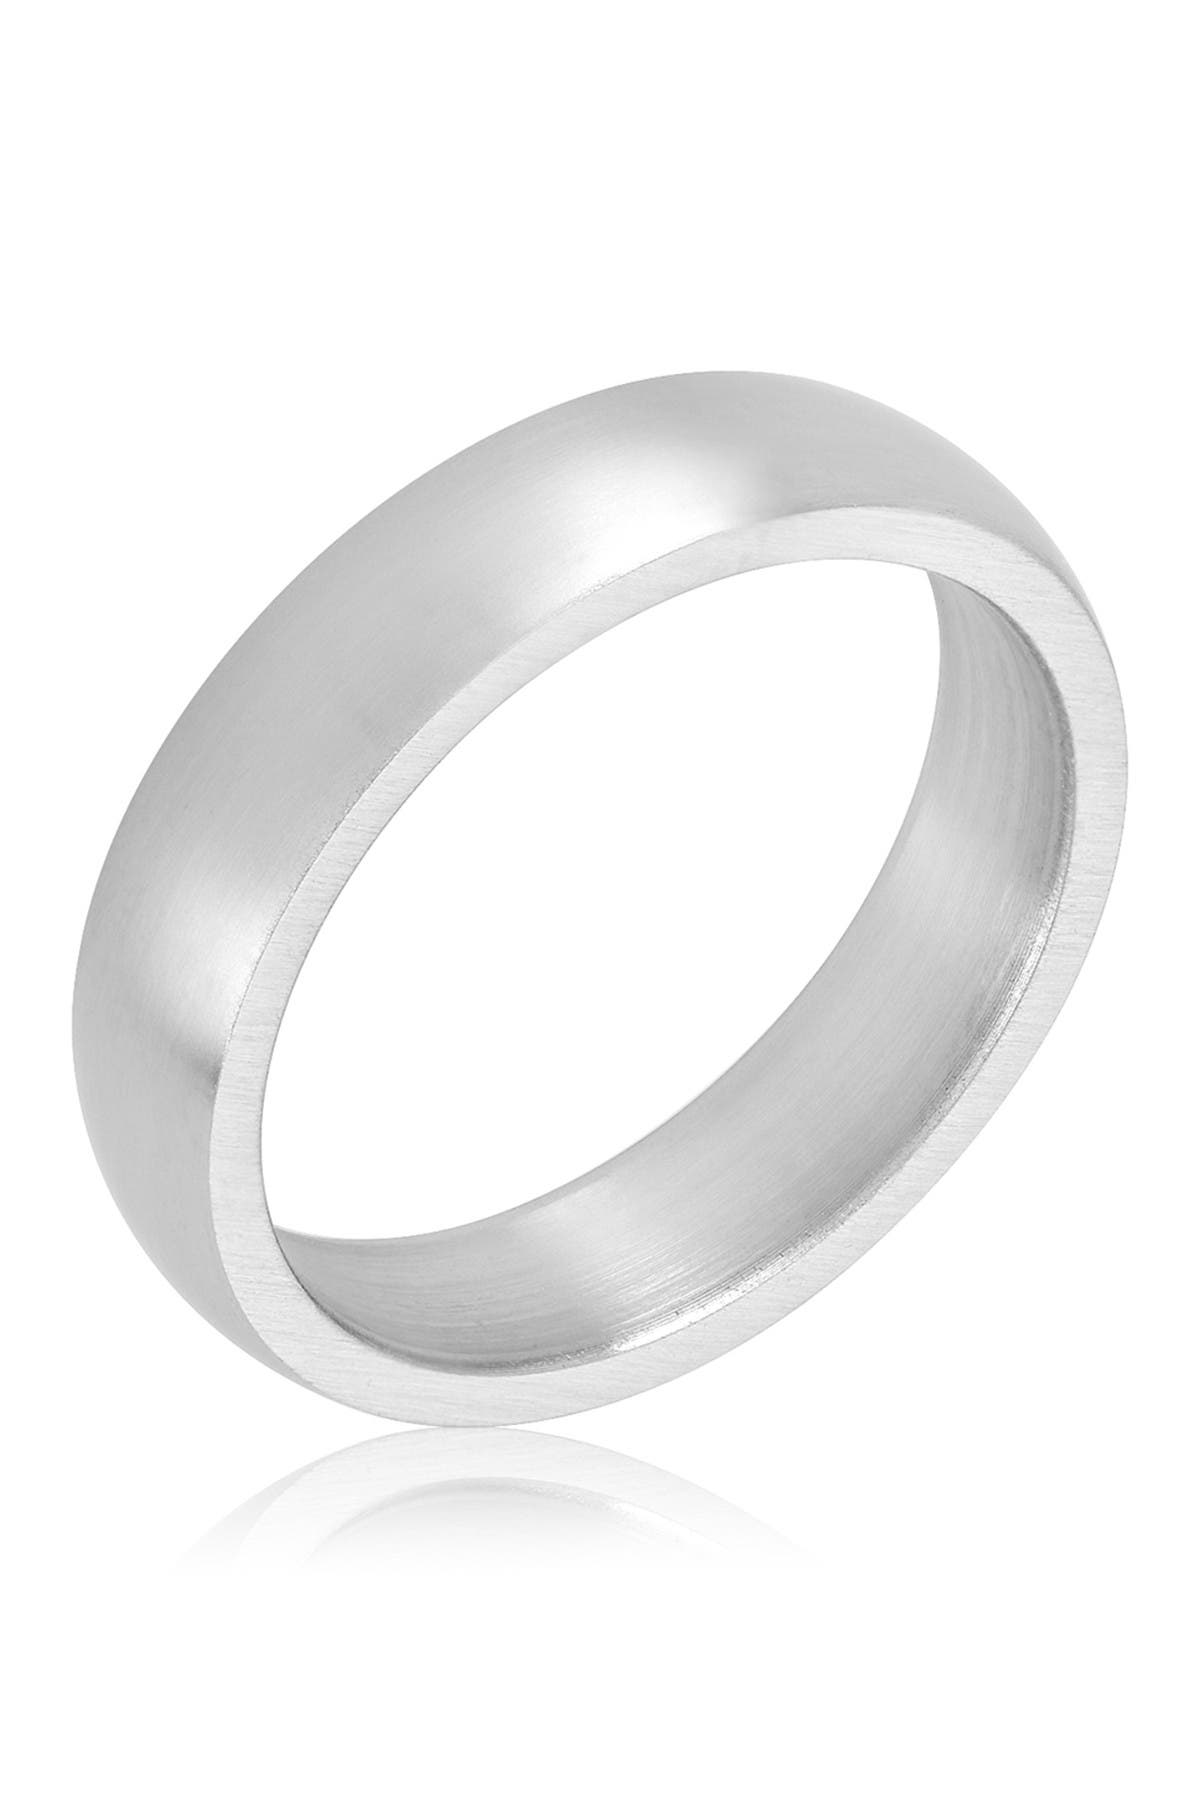 ADORNIA Classic Matte Silver Band Eternity Ring